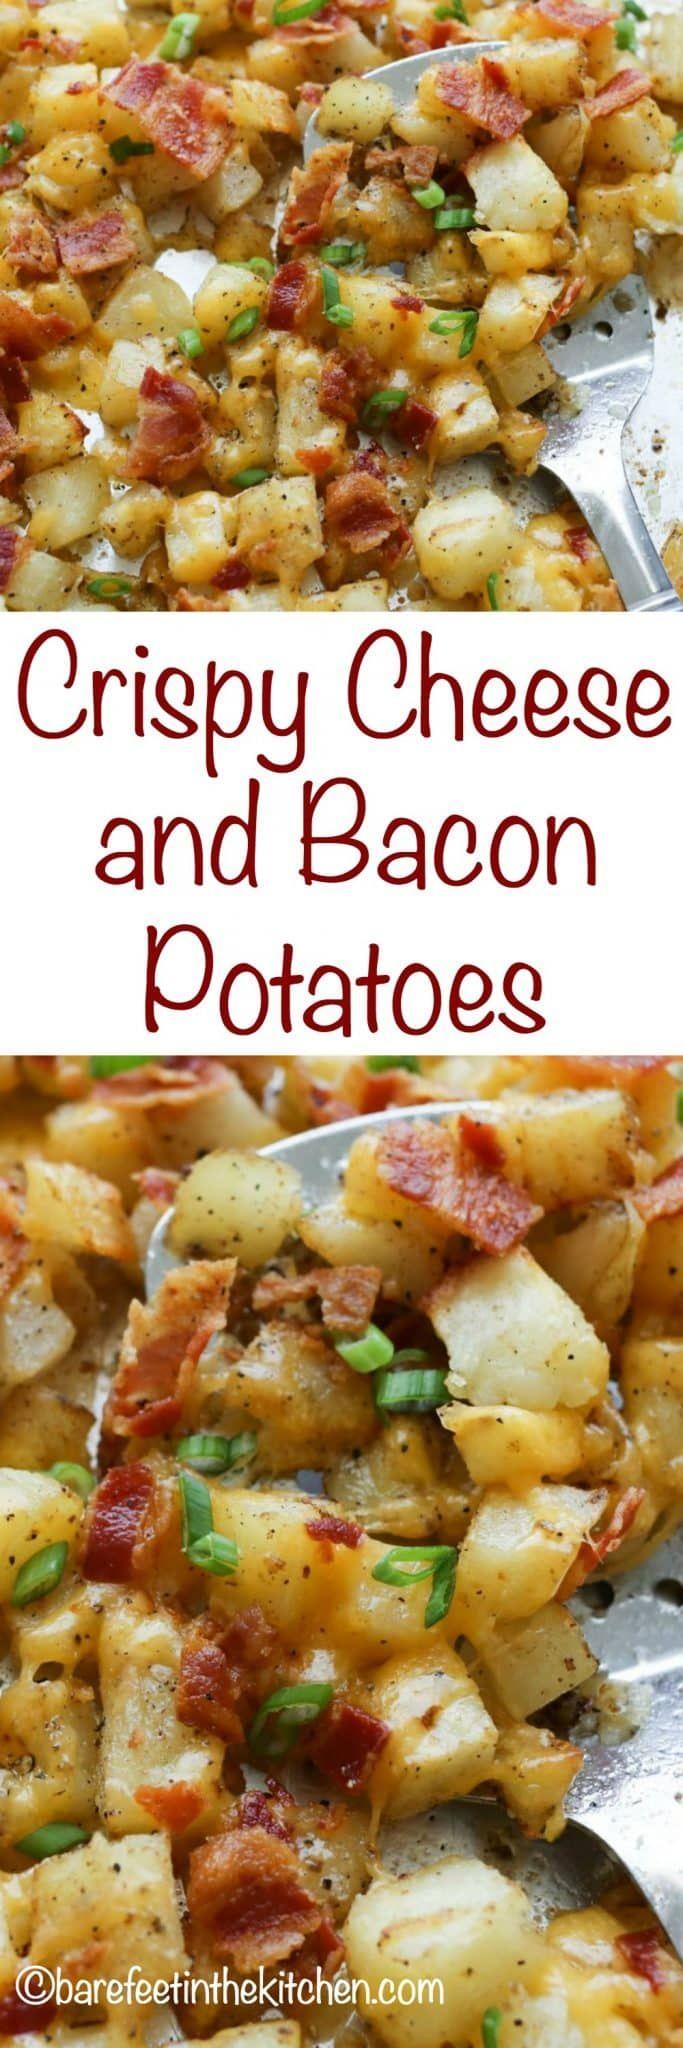 Crispy Cheese and Bacon Potatoes Potato Sides, Potato Side Dishes, Potato Meals, Baby Potato Recipes, Breakfast Casserole, Breakfast Recipes, Breakfast Ideas, Eat Breakfast, Breakfast Healthy